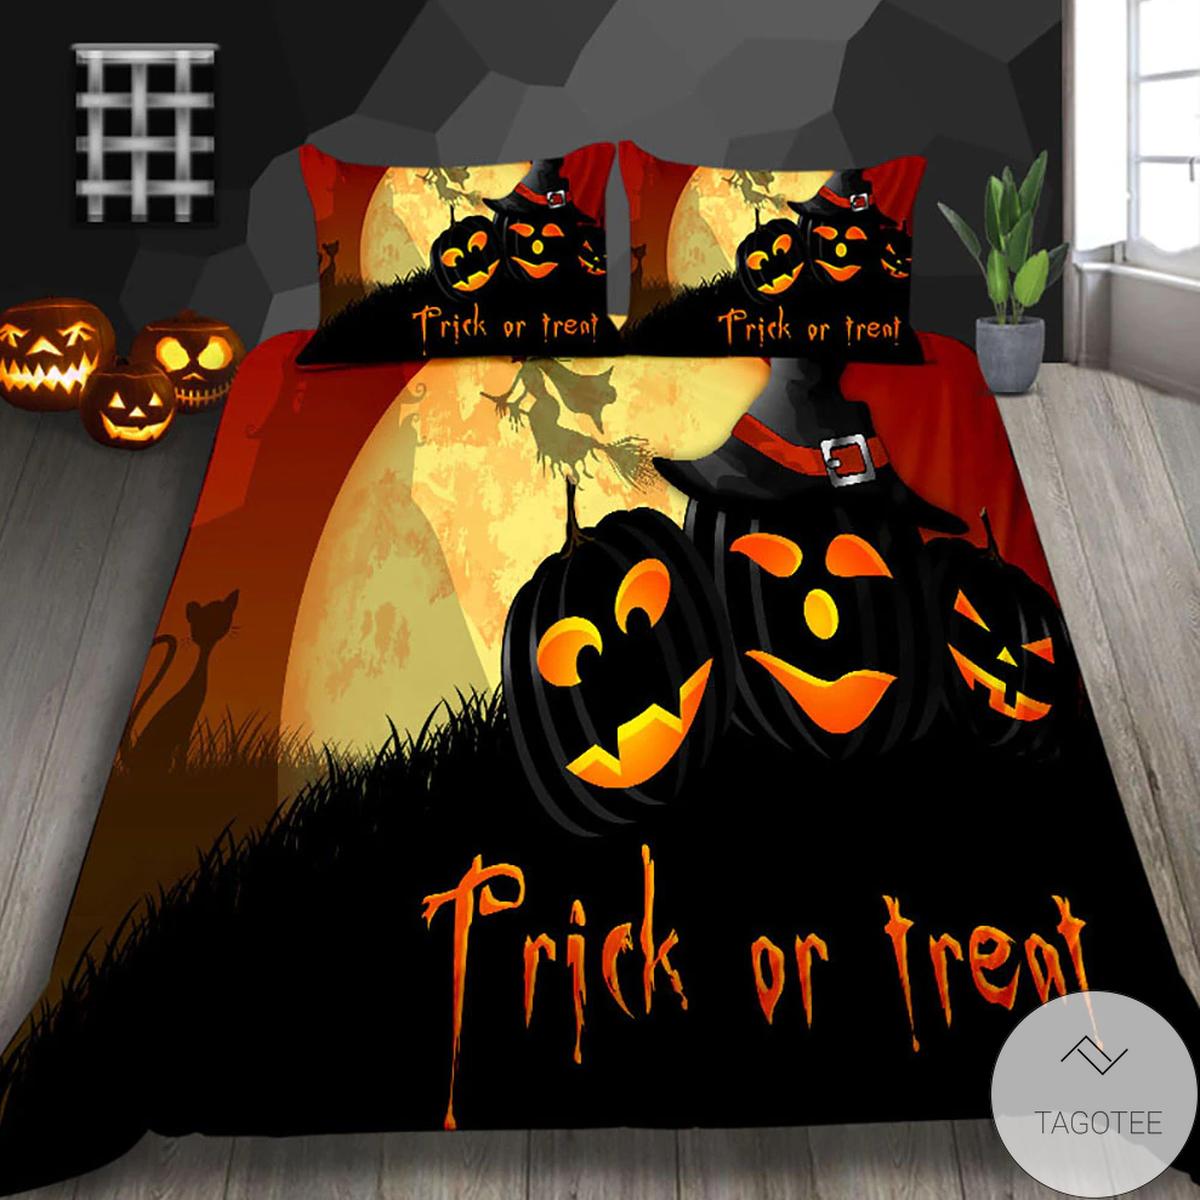 Only For Fan Trick Or Treat Pumpkin Halloween Bedding Set